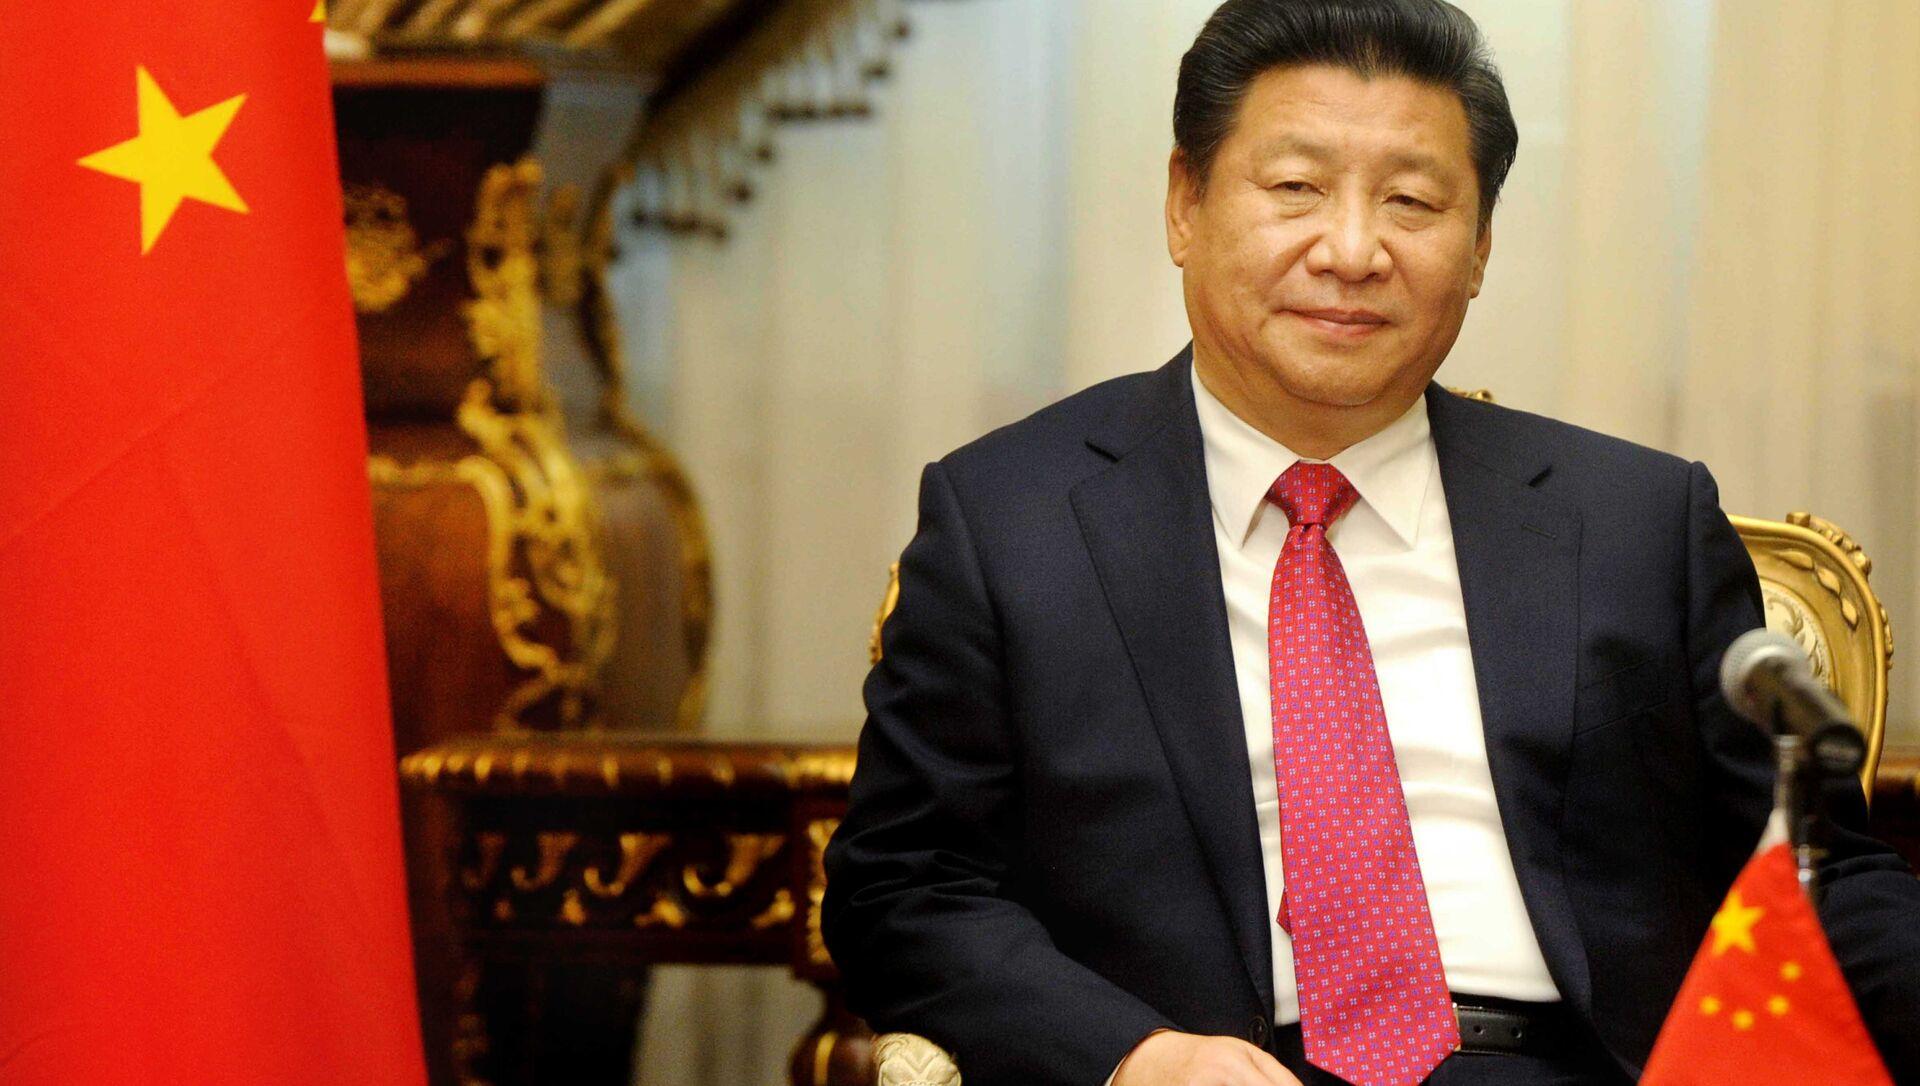 Le président chinois Xi Jiping  - Sputnik France, 1920, 23.07.2021